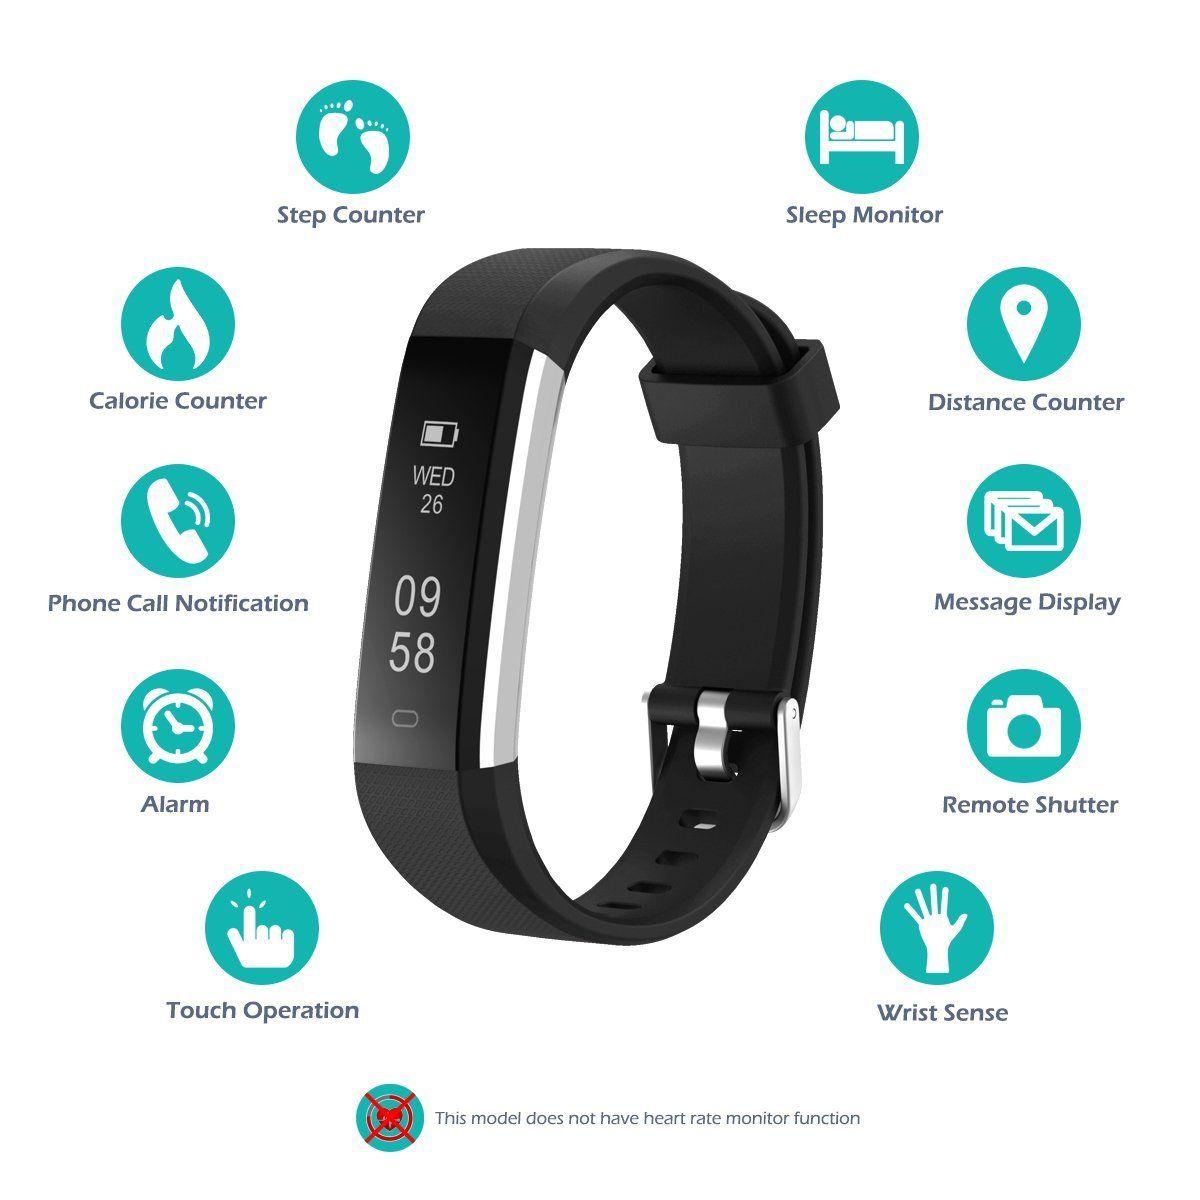 Fitness Tracker Watch Fitness Tracker Chereeki Activity Tracker Ip67 Waterproof With Replaceable Stra Fitness Watch Tracker Fitness Tracker Activity Tracker